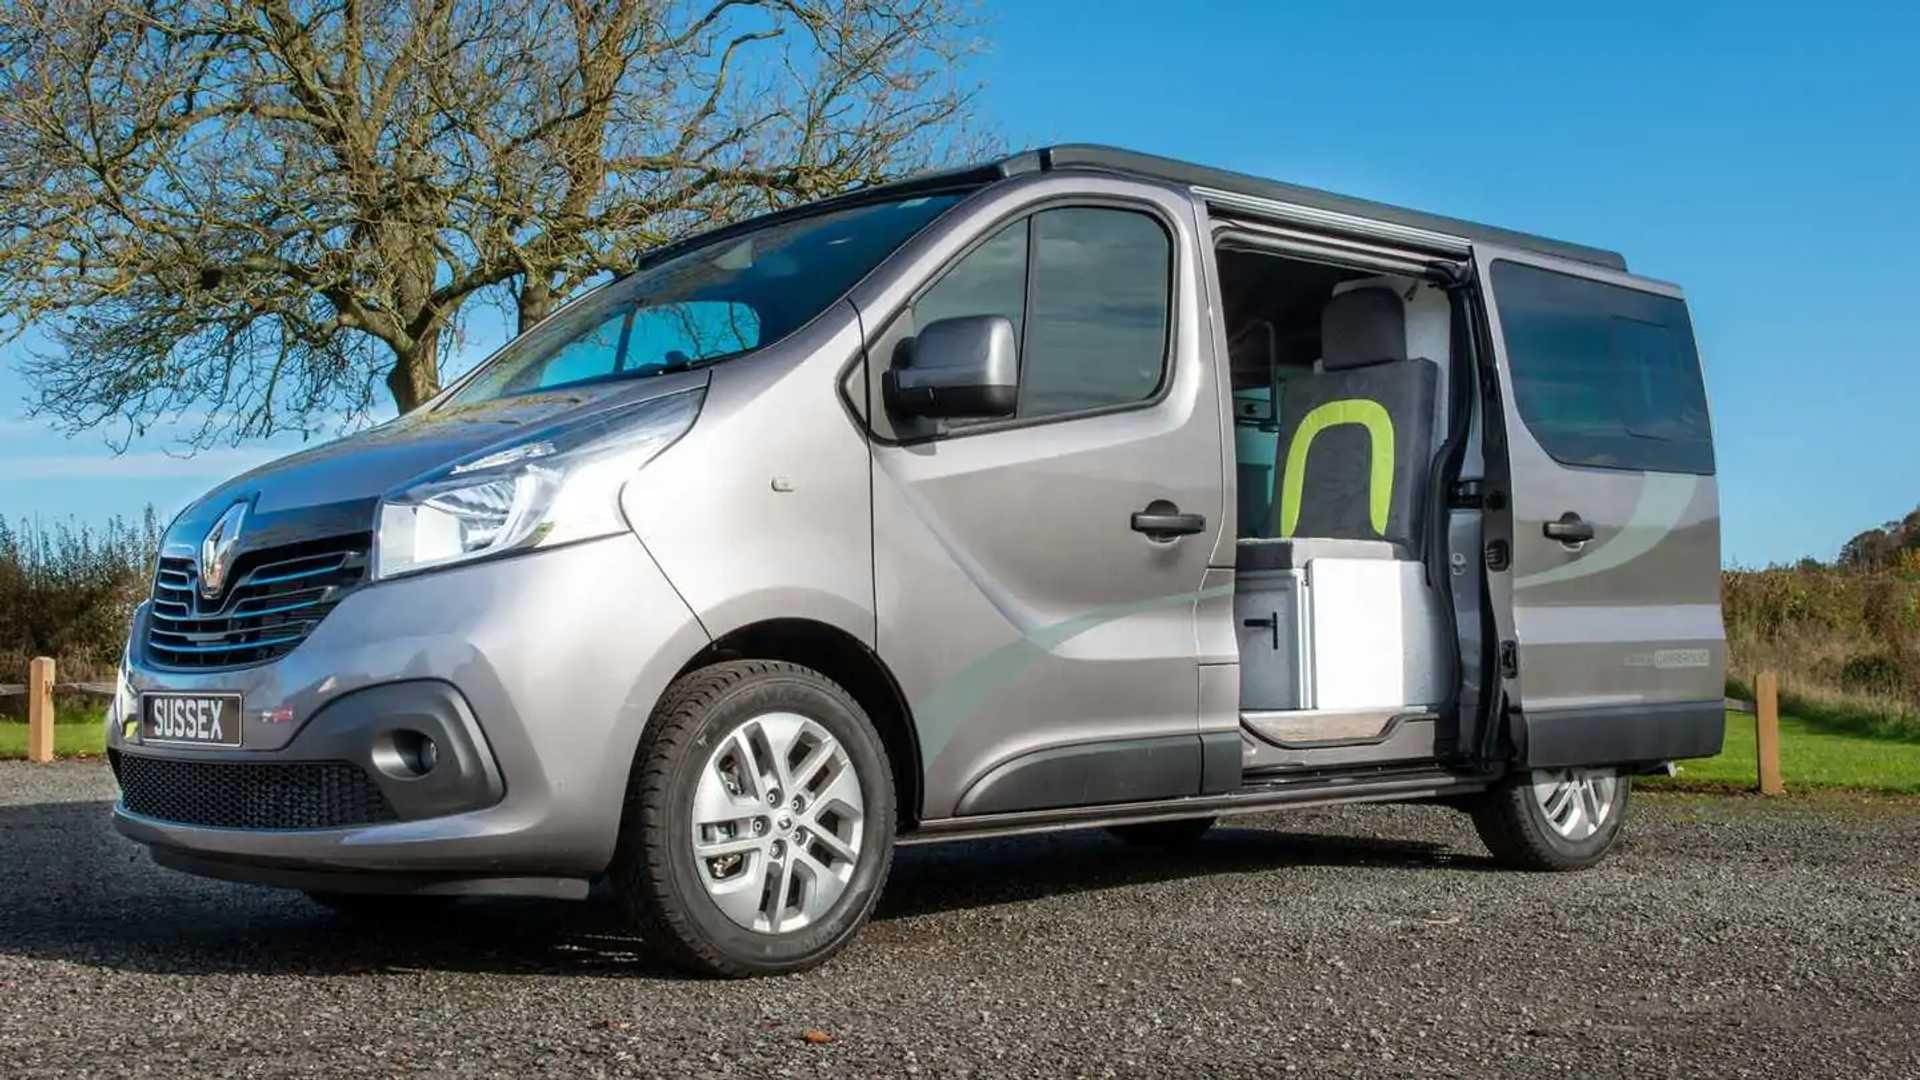 British Firm Creates 42 000 Renault Trafic Campervan